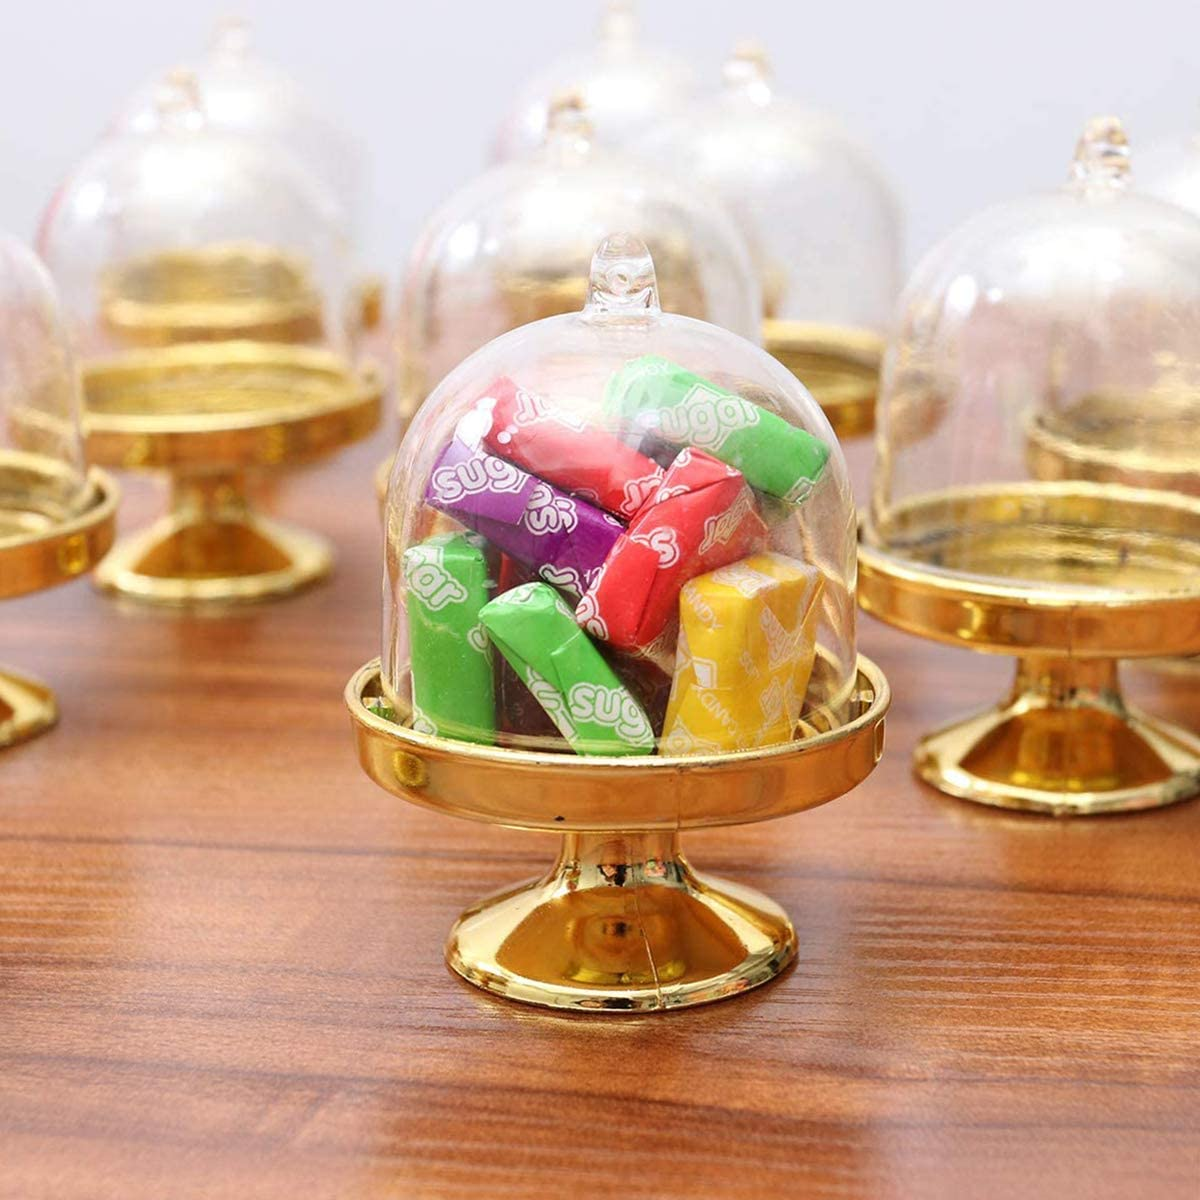 Guador Mini Soporte Pastel Pl/ástico Dorado, Plateado 24 Piezas Platos Caramelo Cake Stand Display Plat para Postres Cupcakes Peque/ños Boda Cumplea/ños Suministros Fiesta